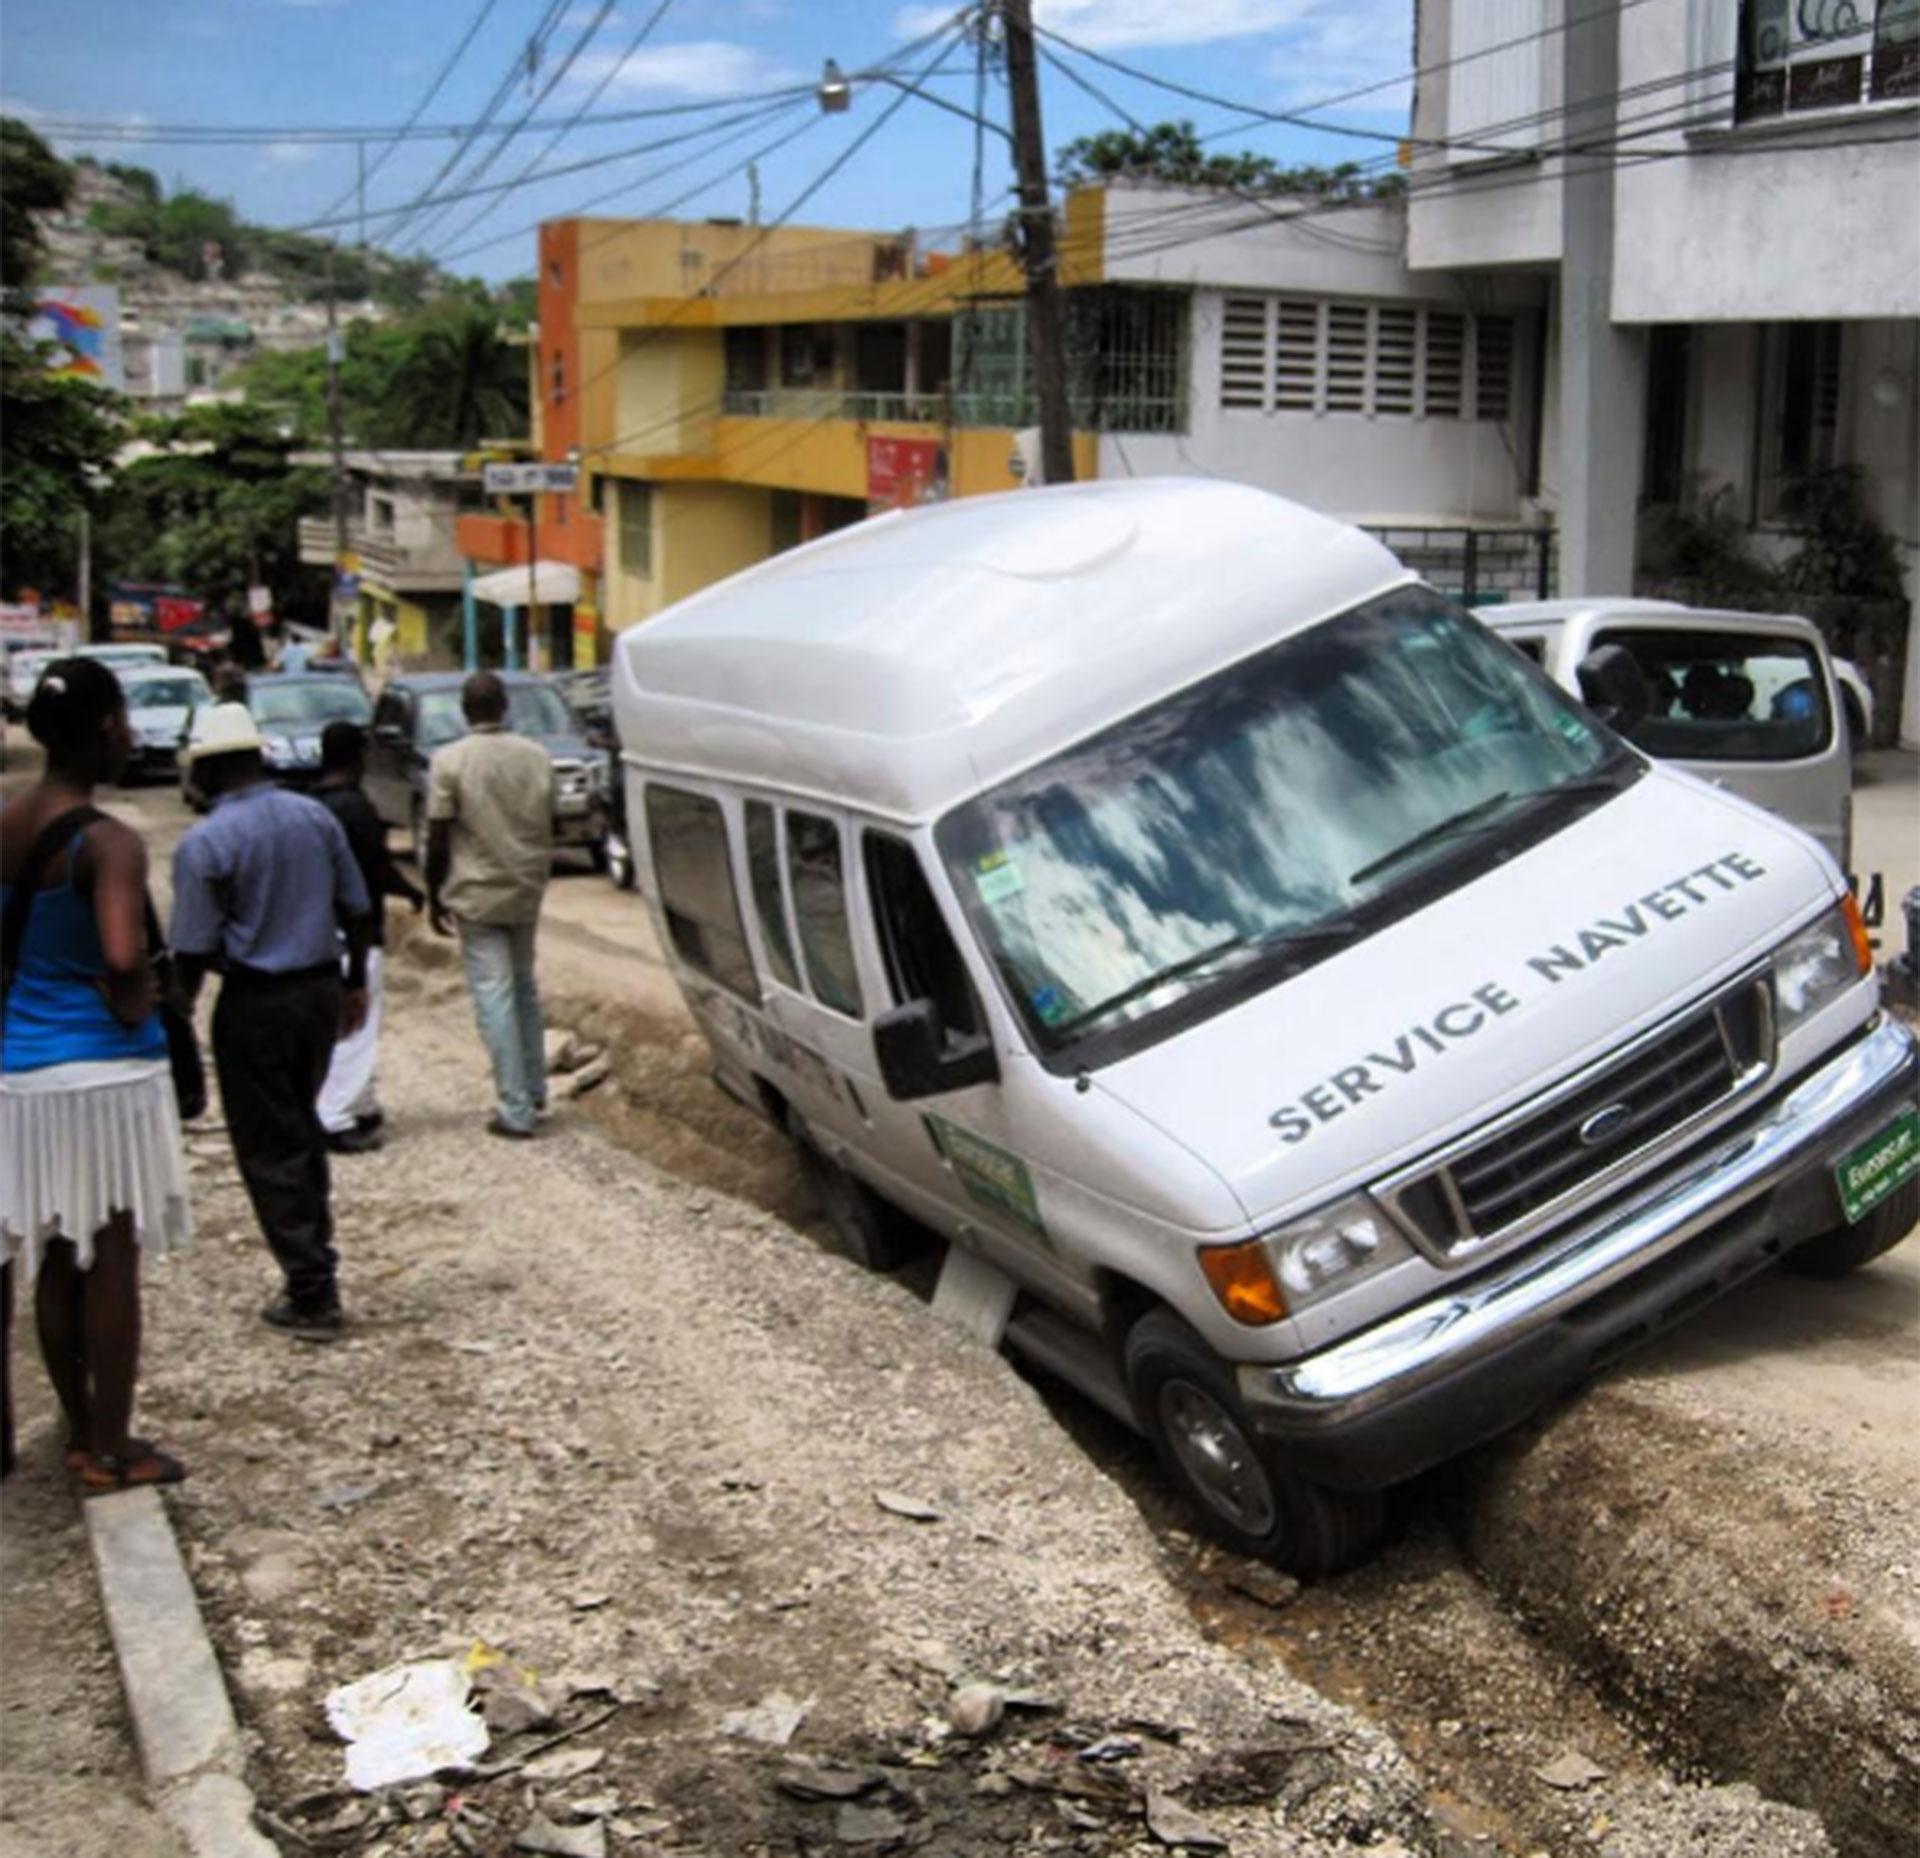 Haití y su pobreza conmovierona Jeppesen